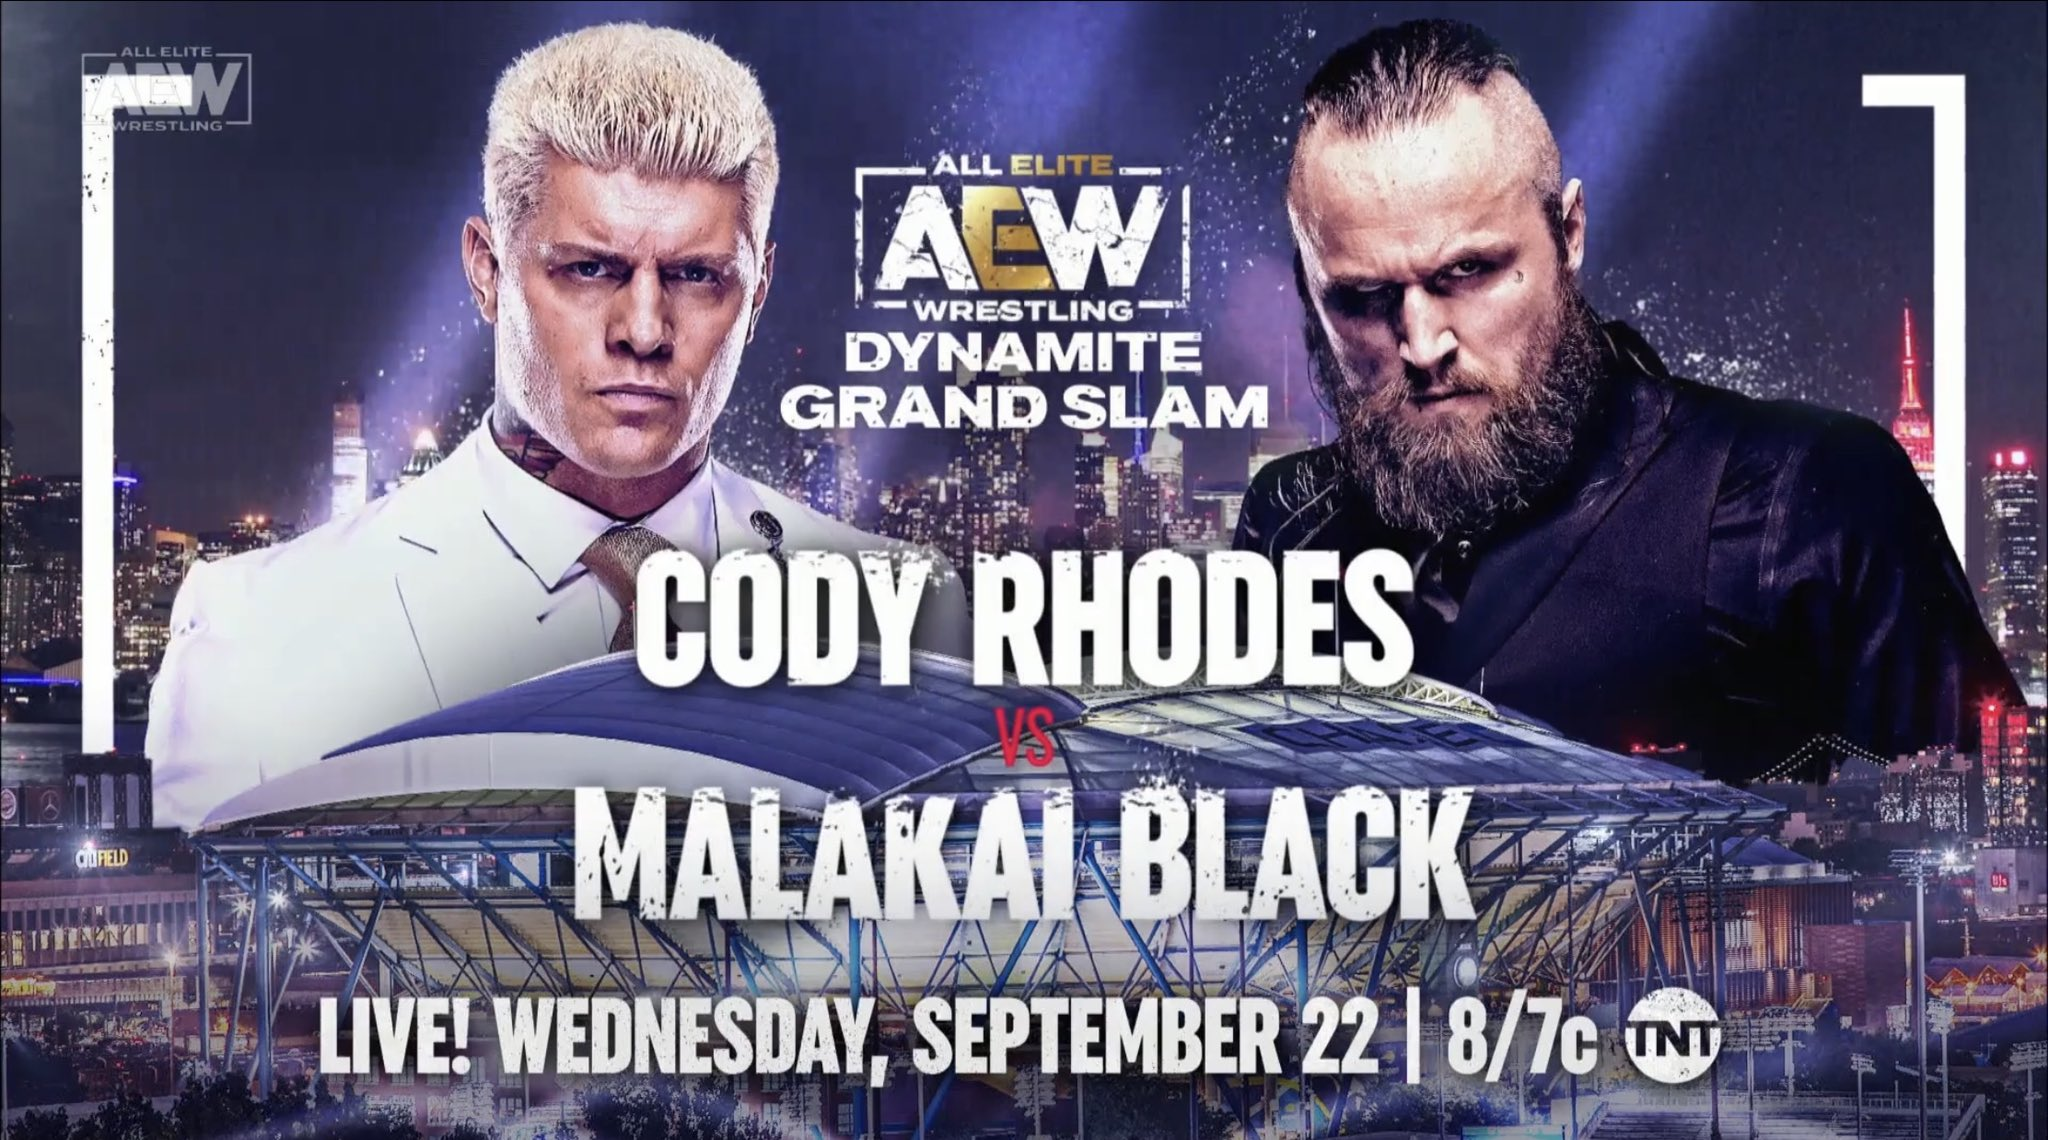 Cody Rhodes vs. Malakai Black acontecerá no AEW Dynamite Grand Slam